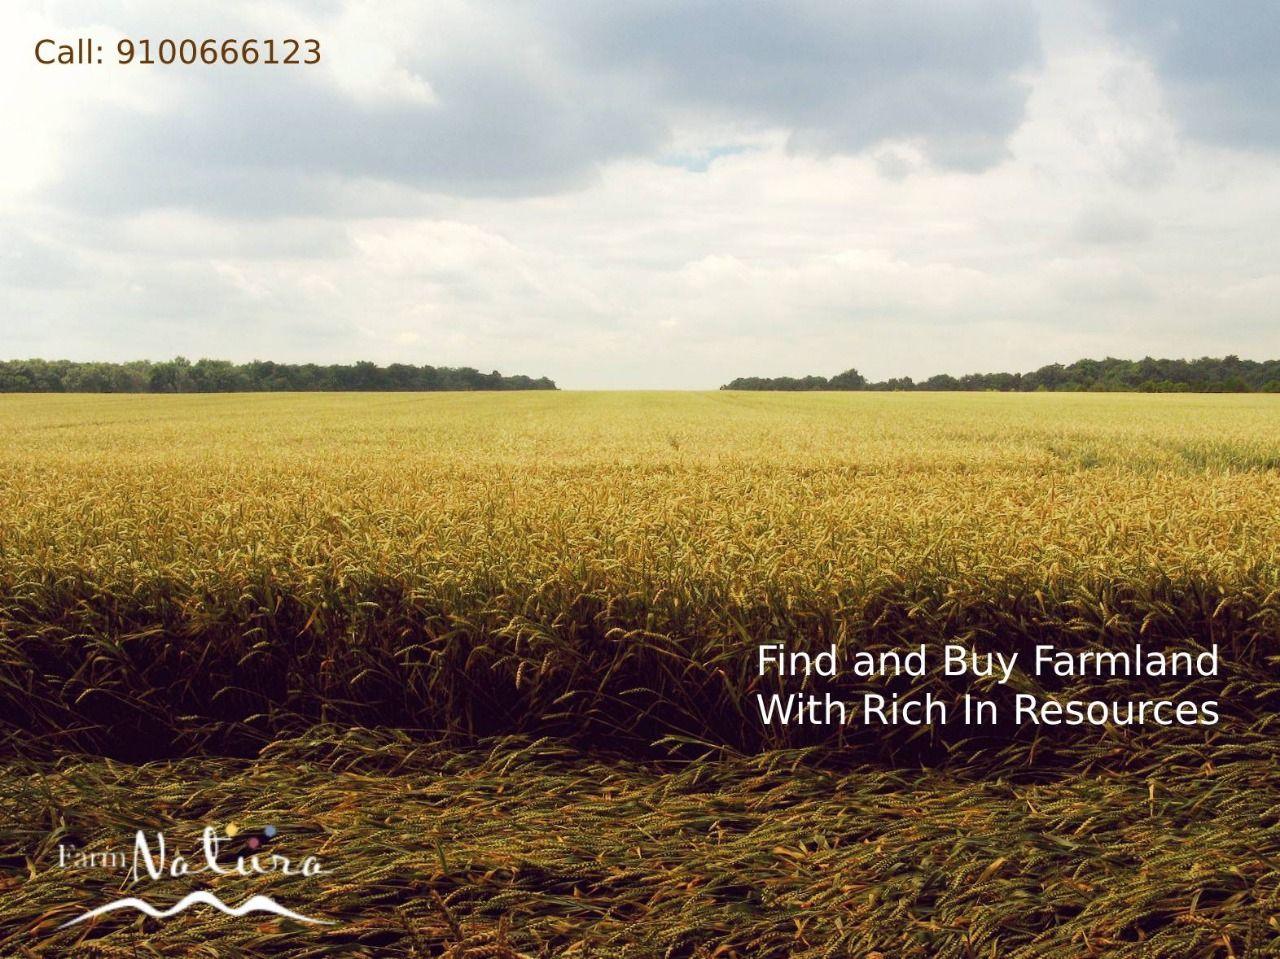 farmnatura.in Farmland for sale, Farmland, How to buy land